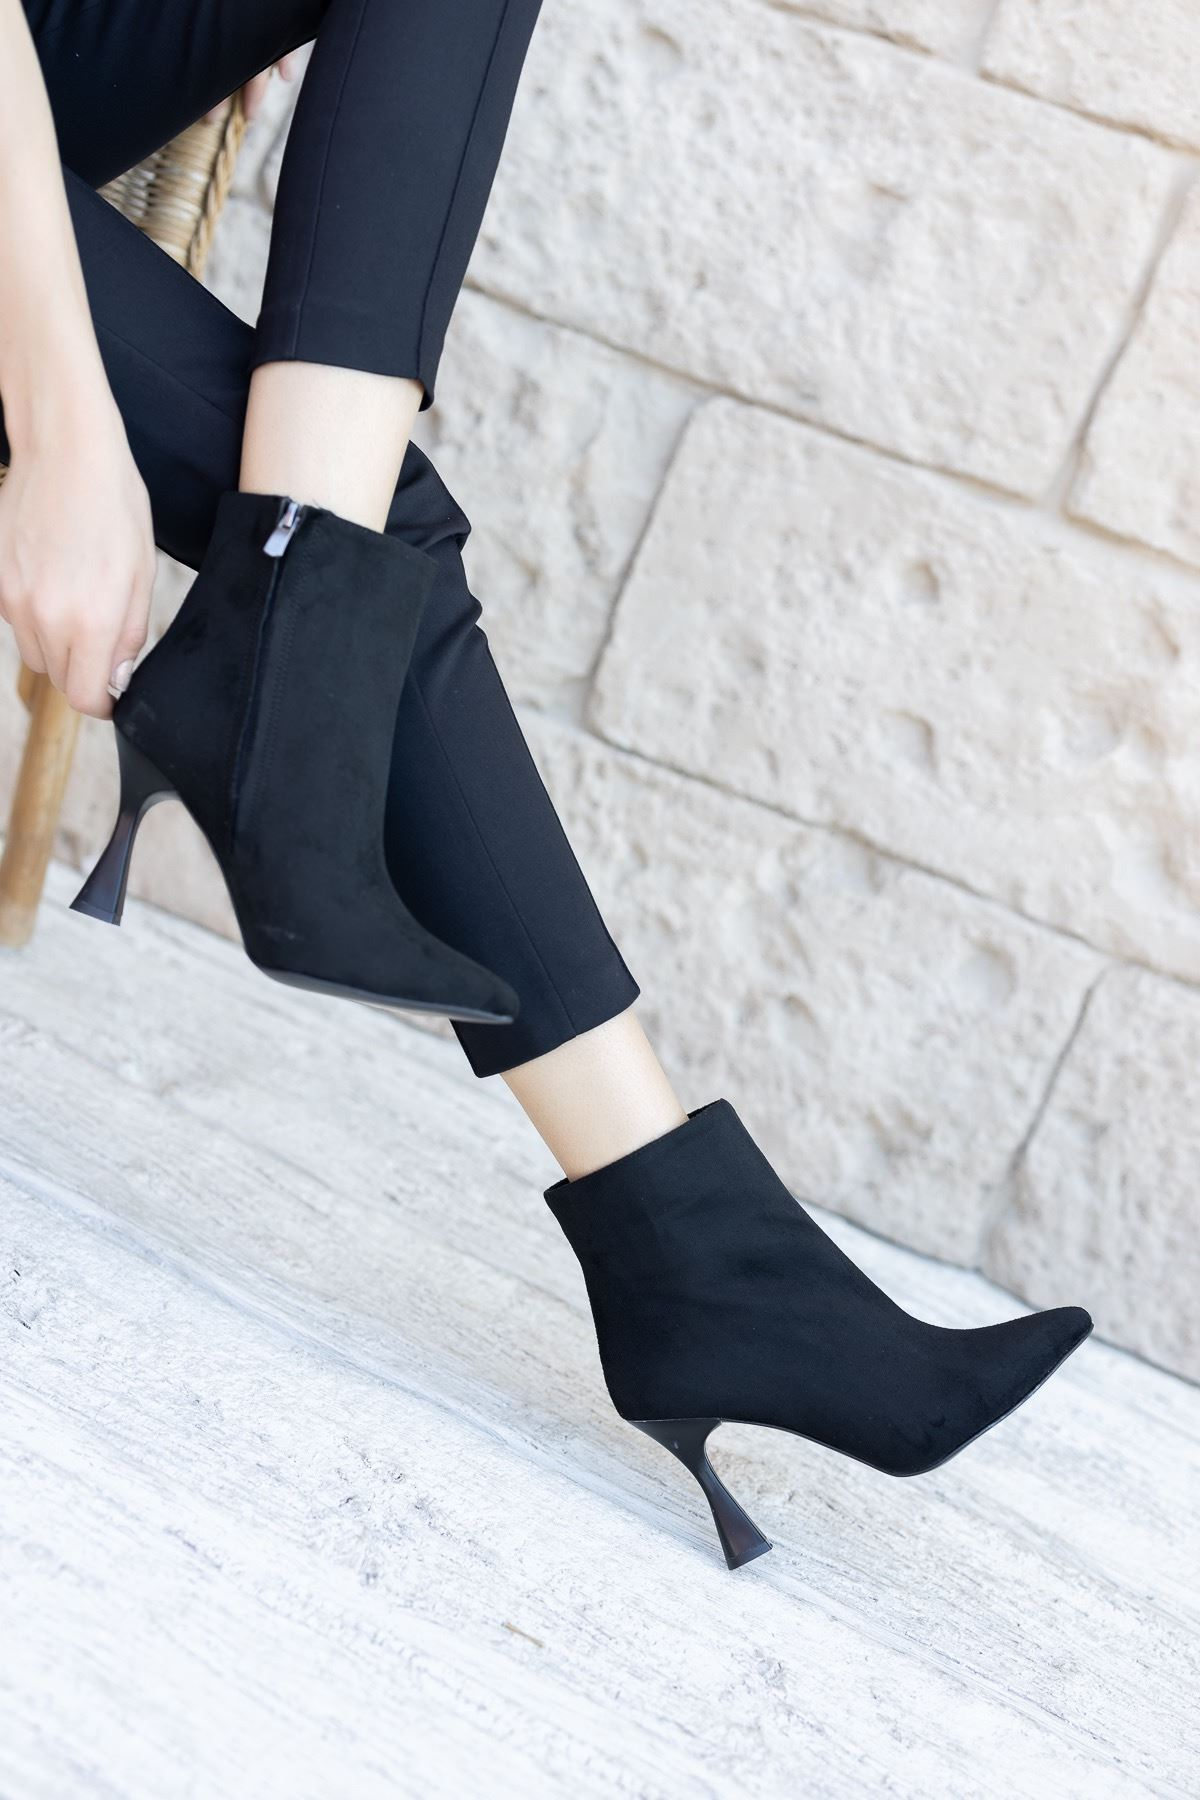 Kadın Beti Yüksek Topuklu Siyah Süet Bot